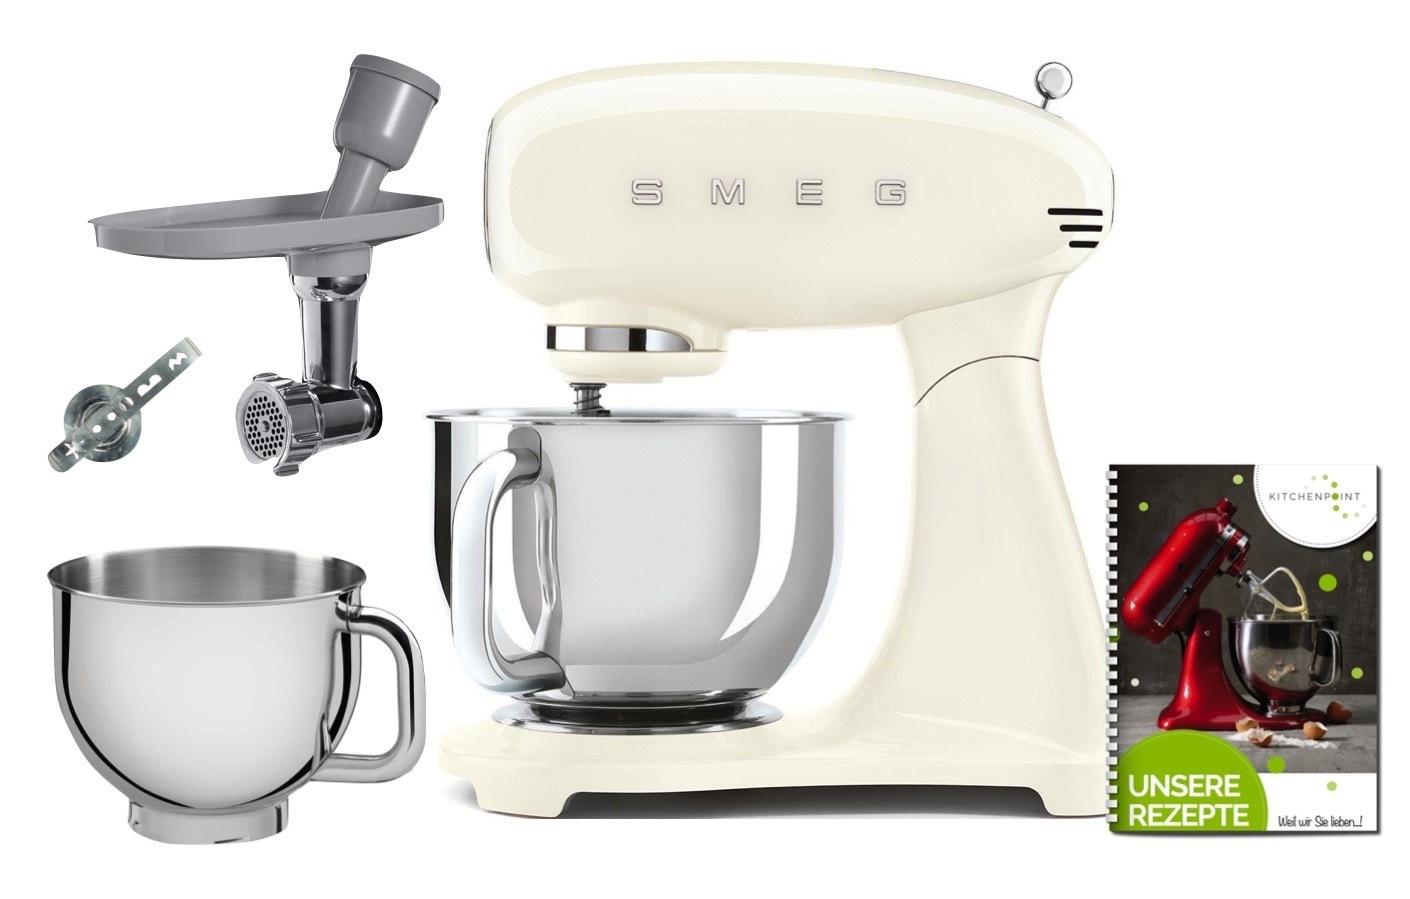 SMEG Küchenmaschine SMF03 Vollfarbe - Back Mega Set Creme